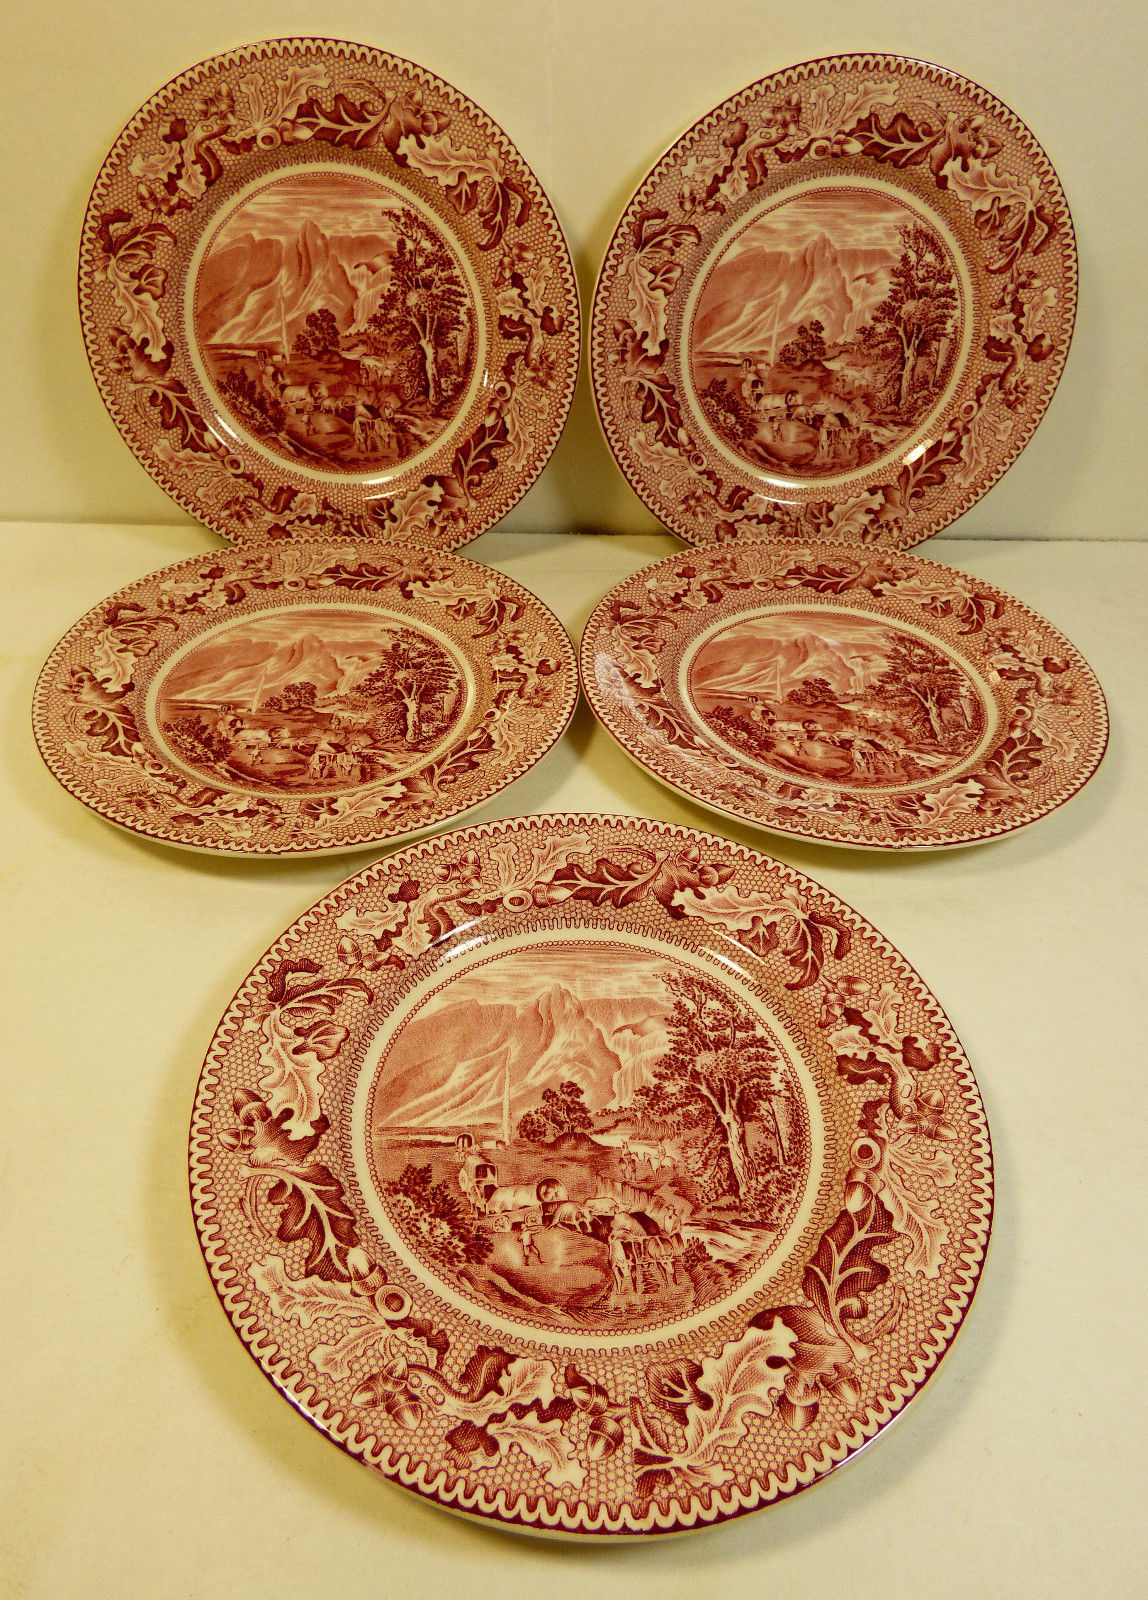 VTG set of 5 Johnson Bros England Historic AmericaCovered Wagon Butter Plate - $49.10